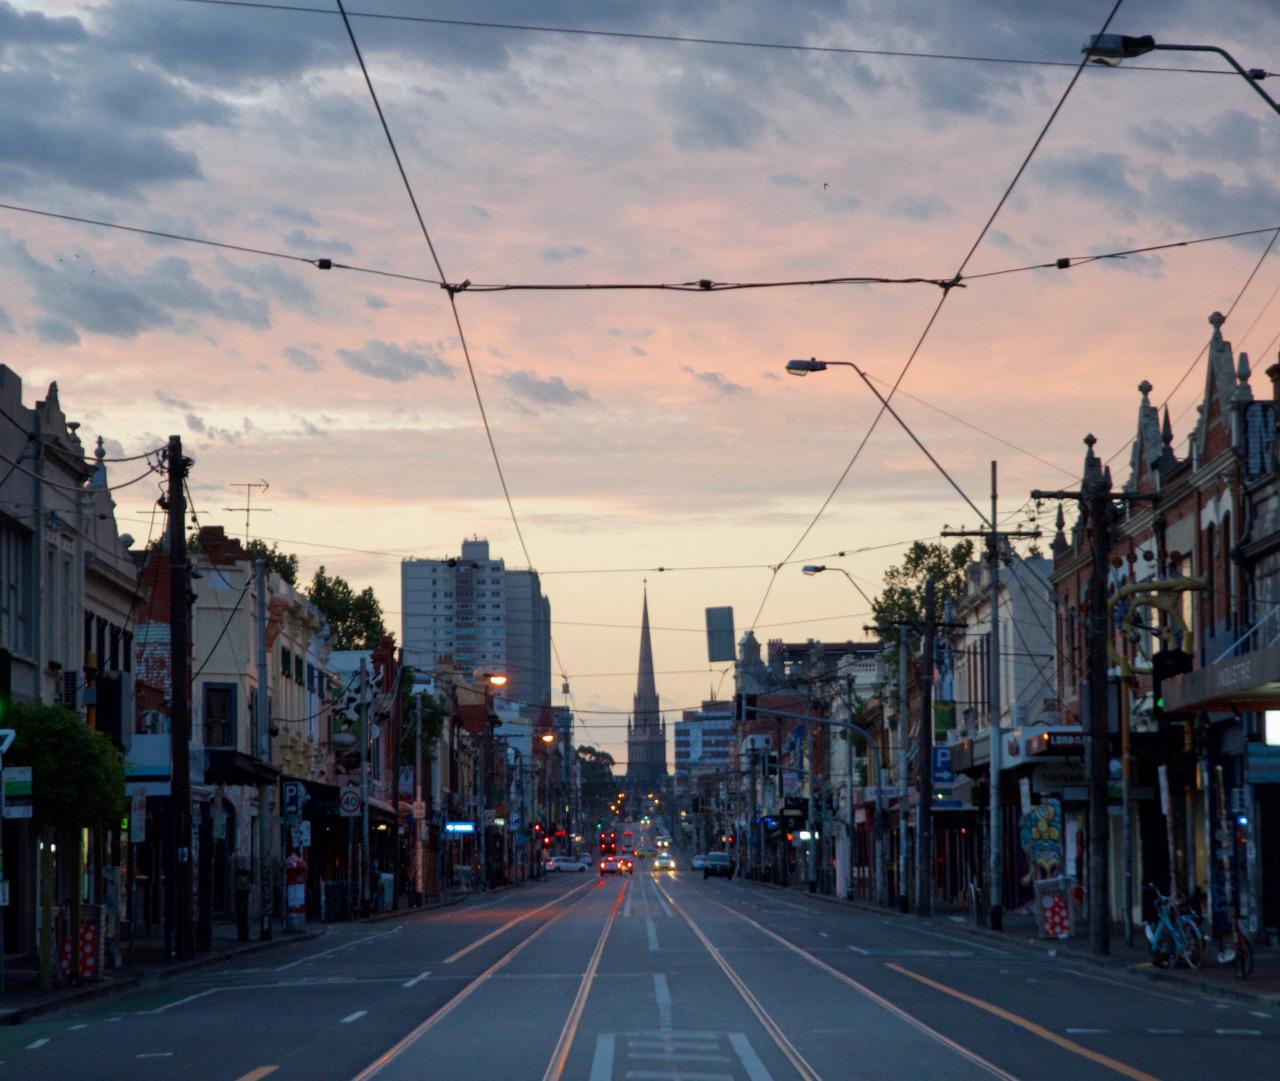 Sleepwalking through Brunswick St in Melbourne, Australia at about 6 am.